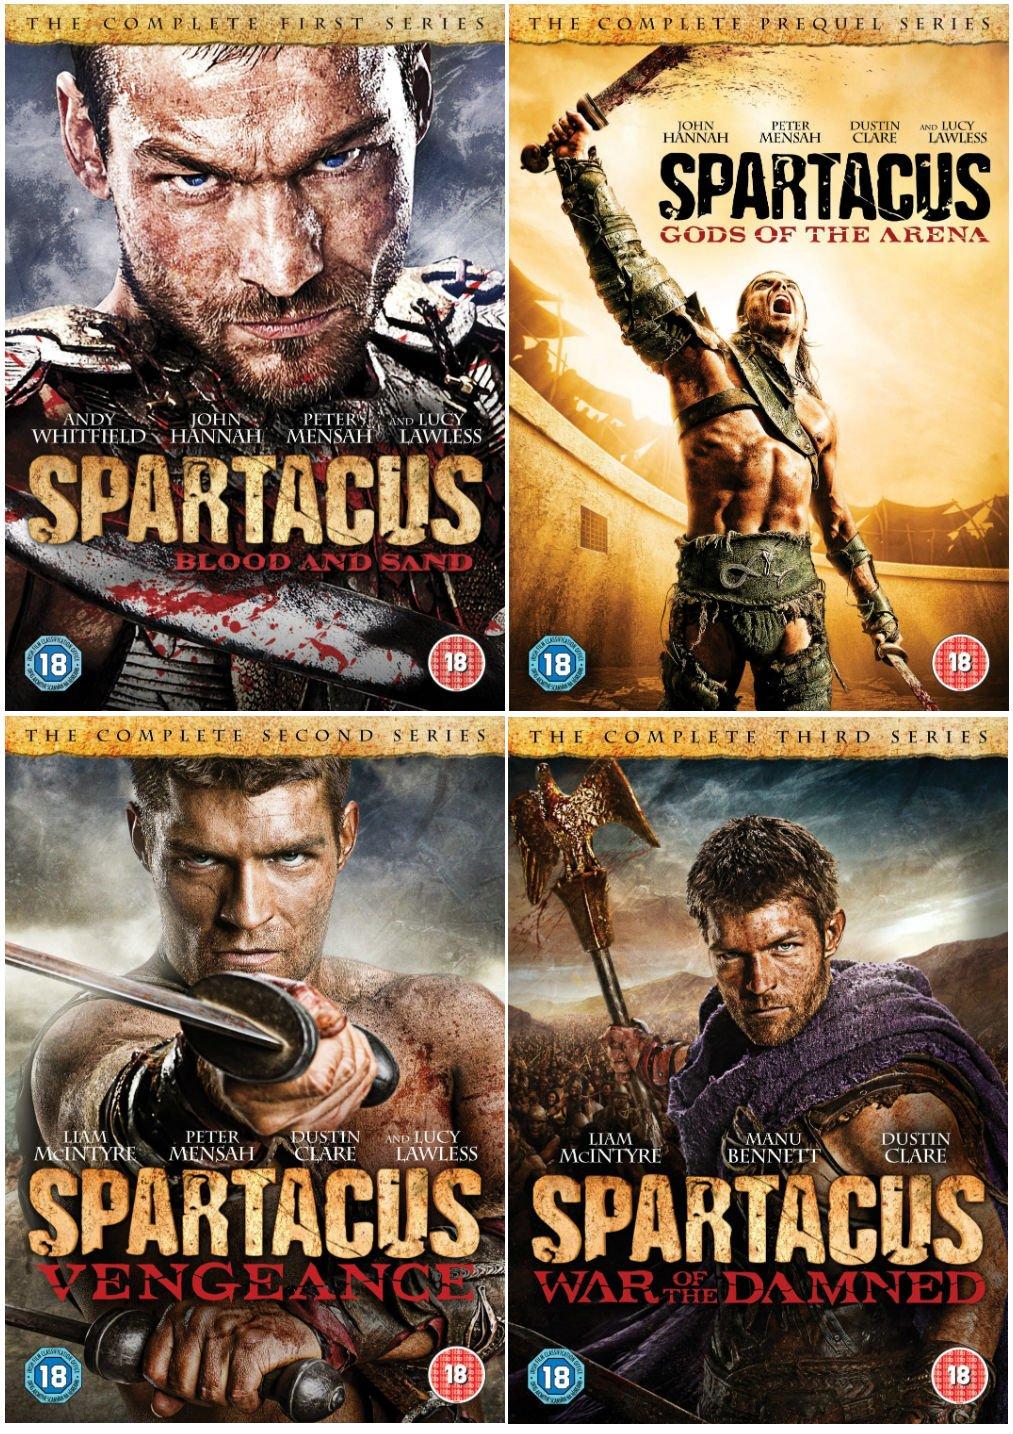 spartacus season 1 episode 2 480p download